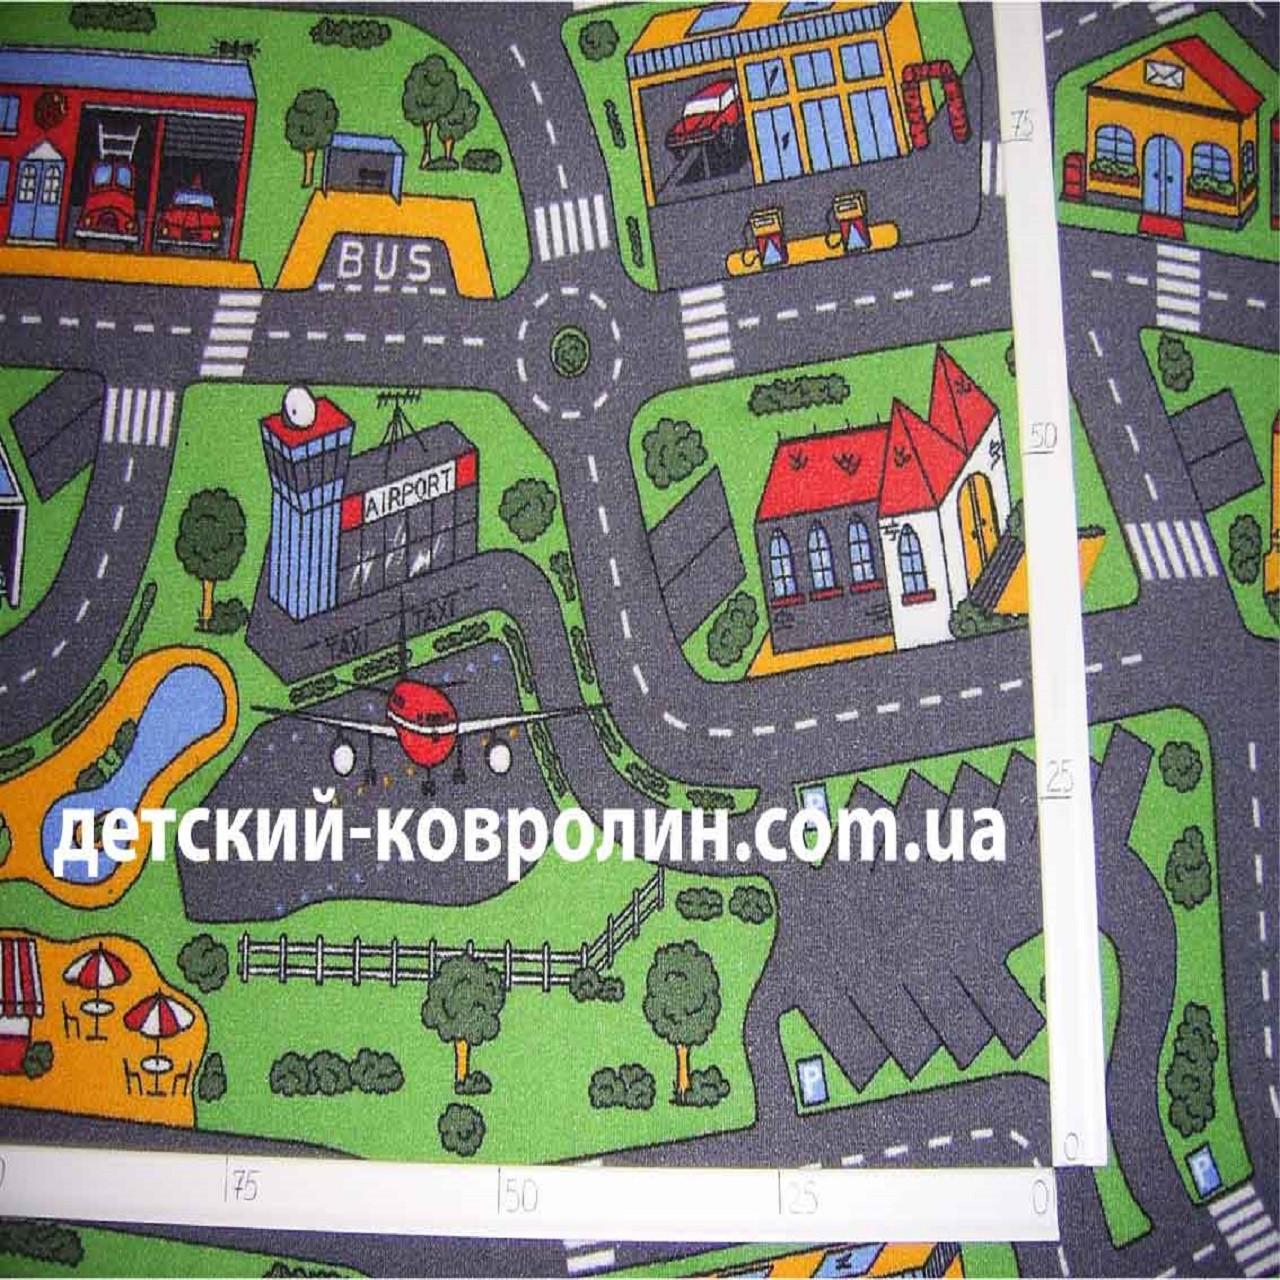 Детская ковровая дорожка Сити Лайф 3, Сити Лайф, войлочная, полиамид, 5 мм, Серо-зеленый, 2.5 х (нужная длина)